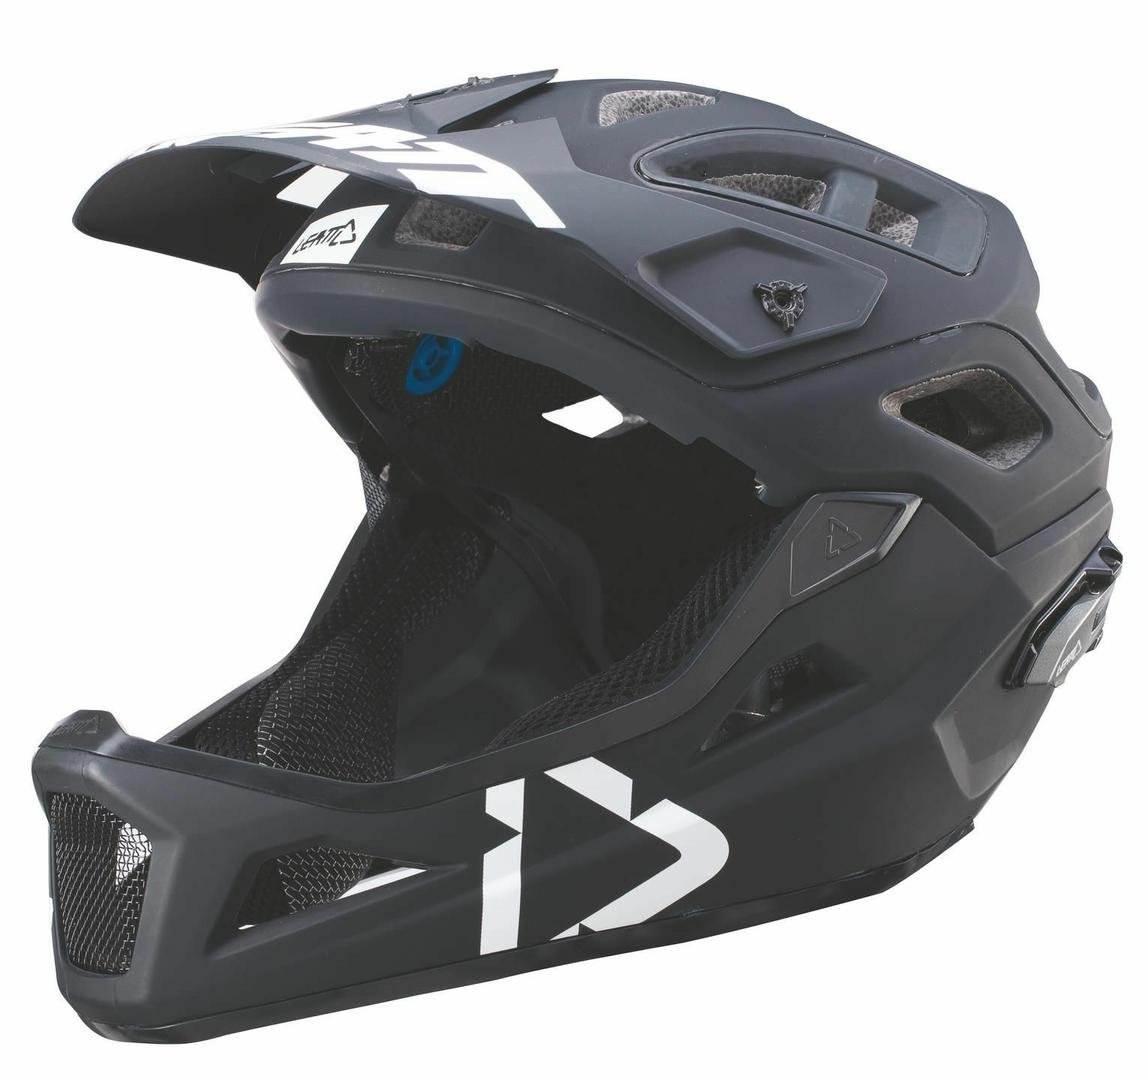 helmet_dbx_3.0_enduro_v2_blk-white_1_